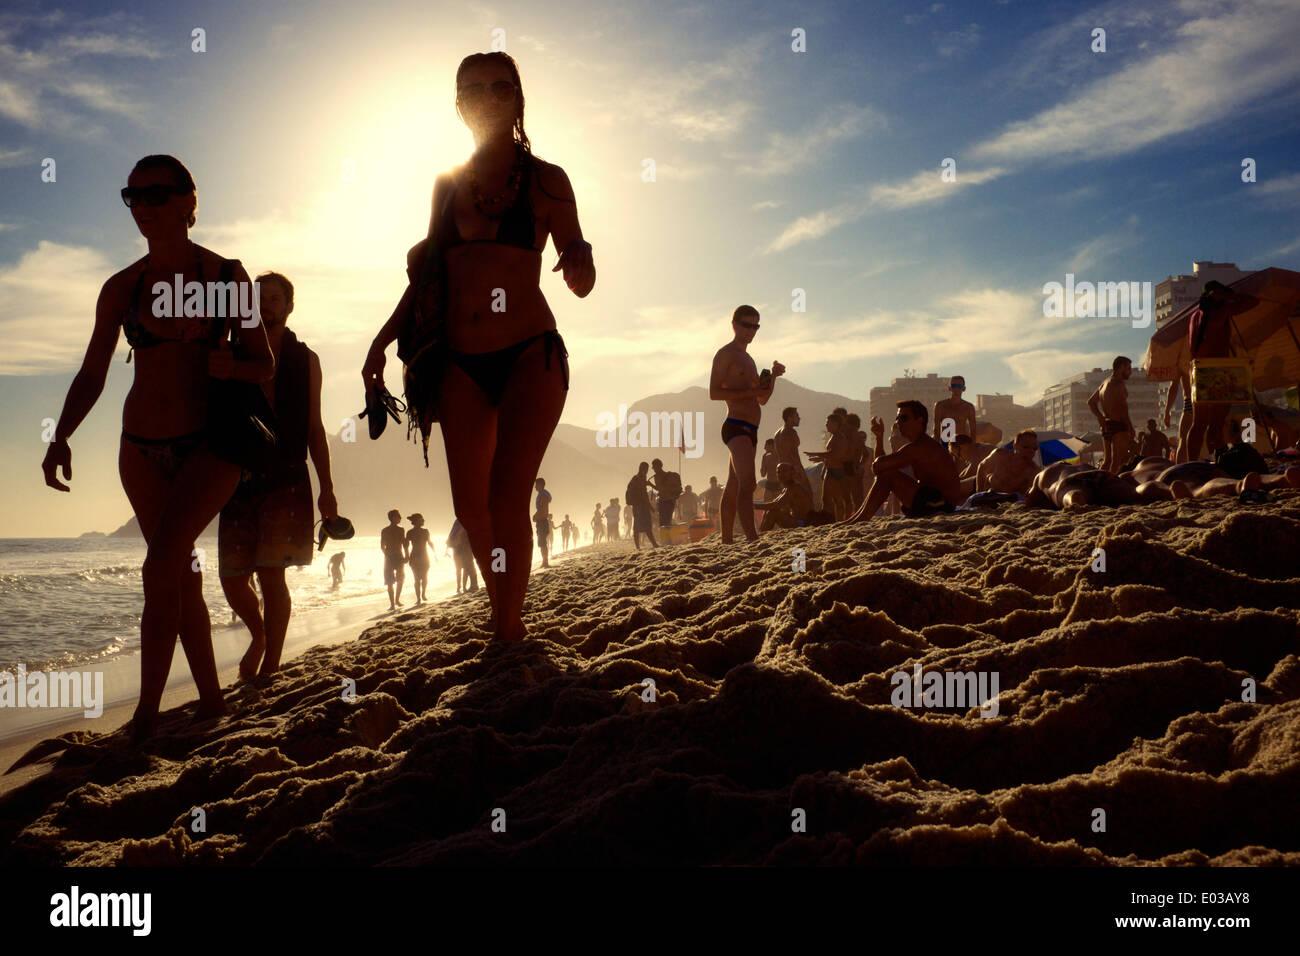 RIO DE JANEIRO, BRAZIL - FEBRUARY 21, 2014: Silhouettes of men and women walking along Ipanema Beach at sunset. - Stock Image